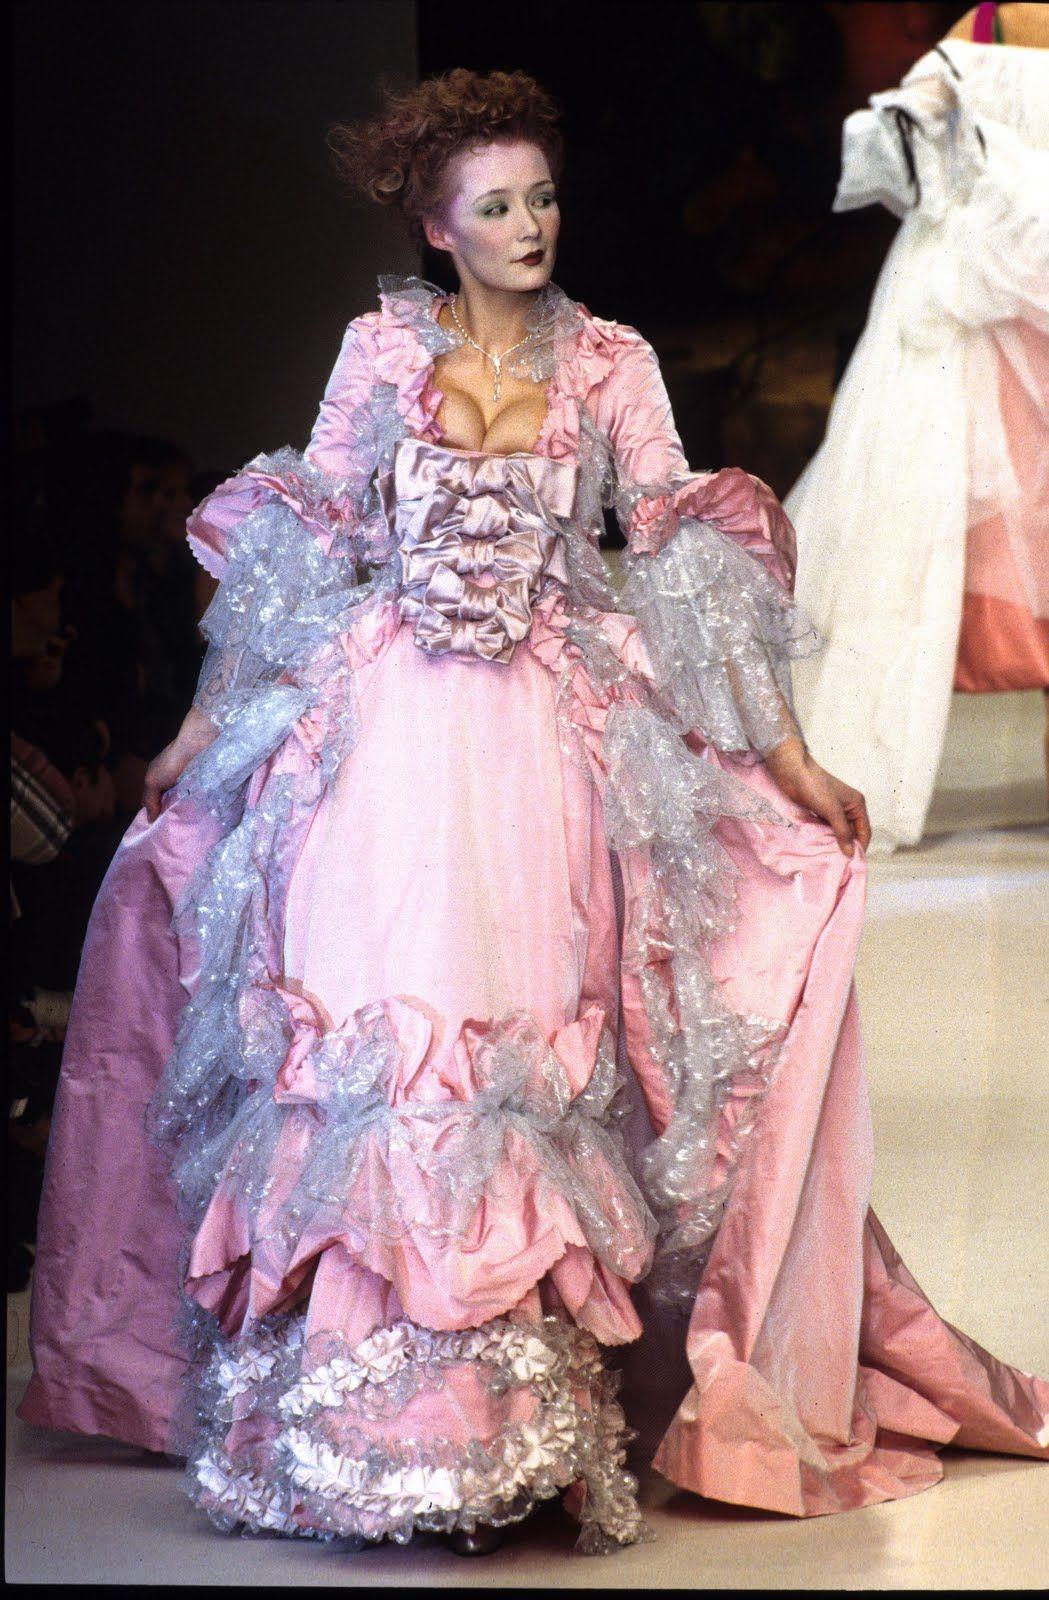 Marie-Antoinette Meets Vivienne Westwood: The 18th Century Back in ...